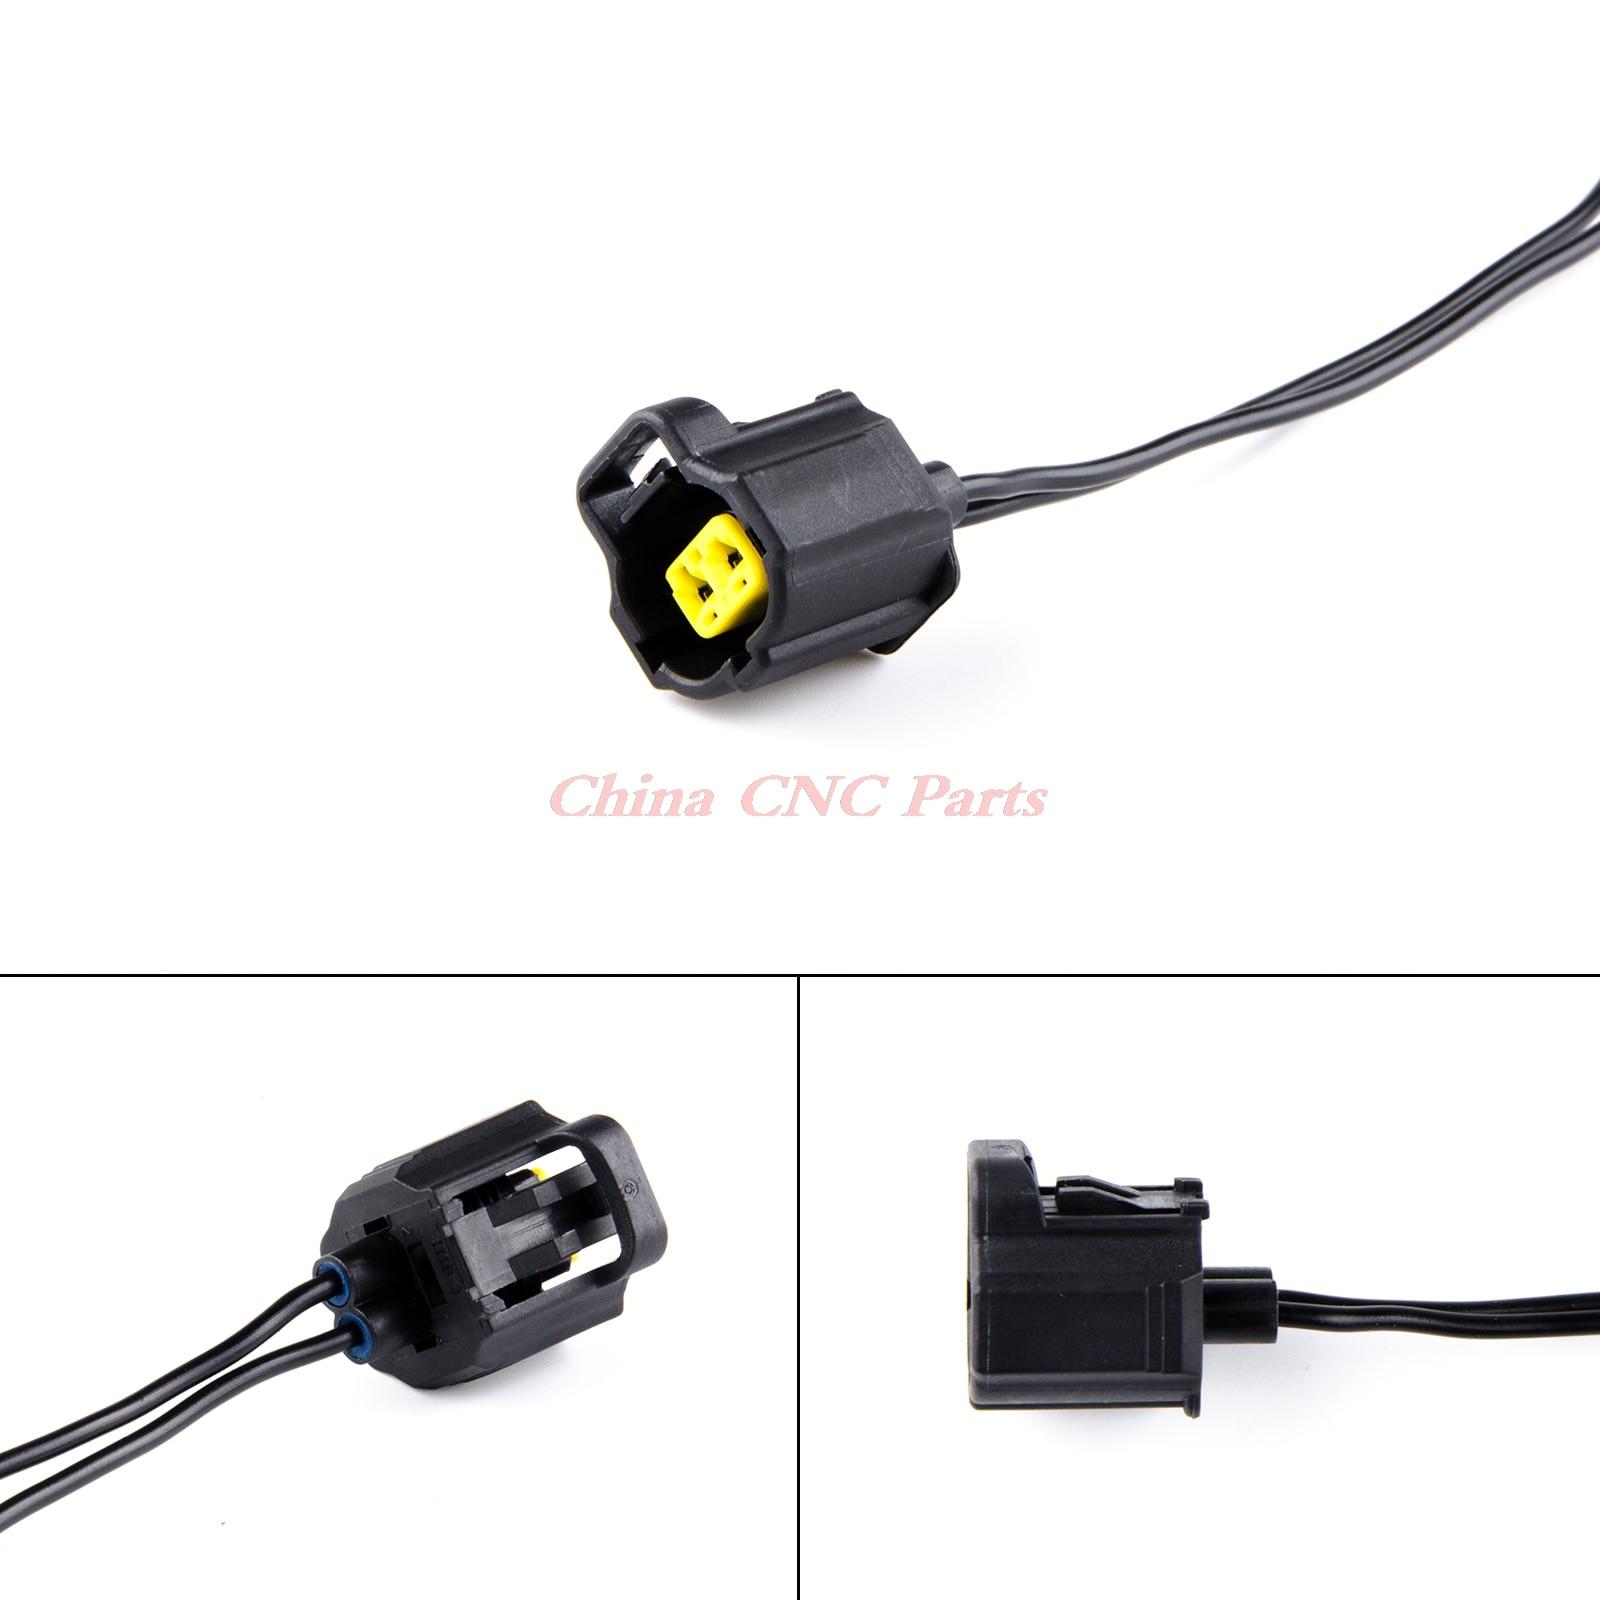 Nicecnc Coolant Temperature Sensor Connector Plug Pigtail Fit For Toyota Solara Corolla Sienna Camry Tundra Tacoma